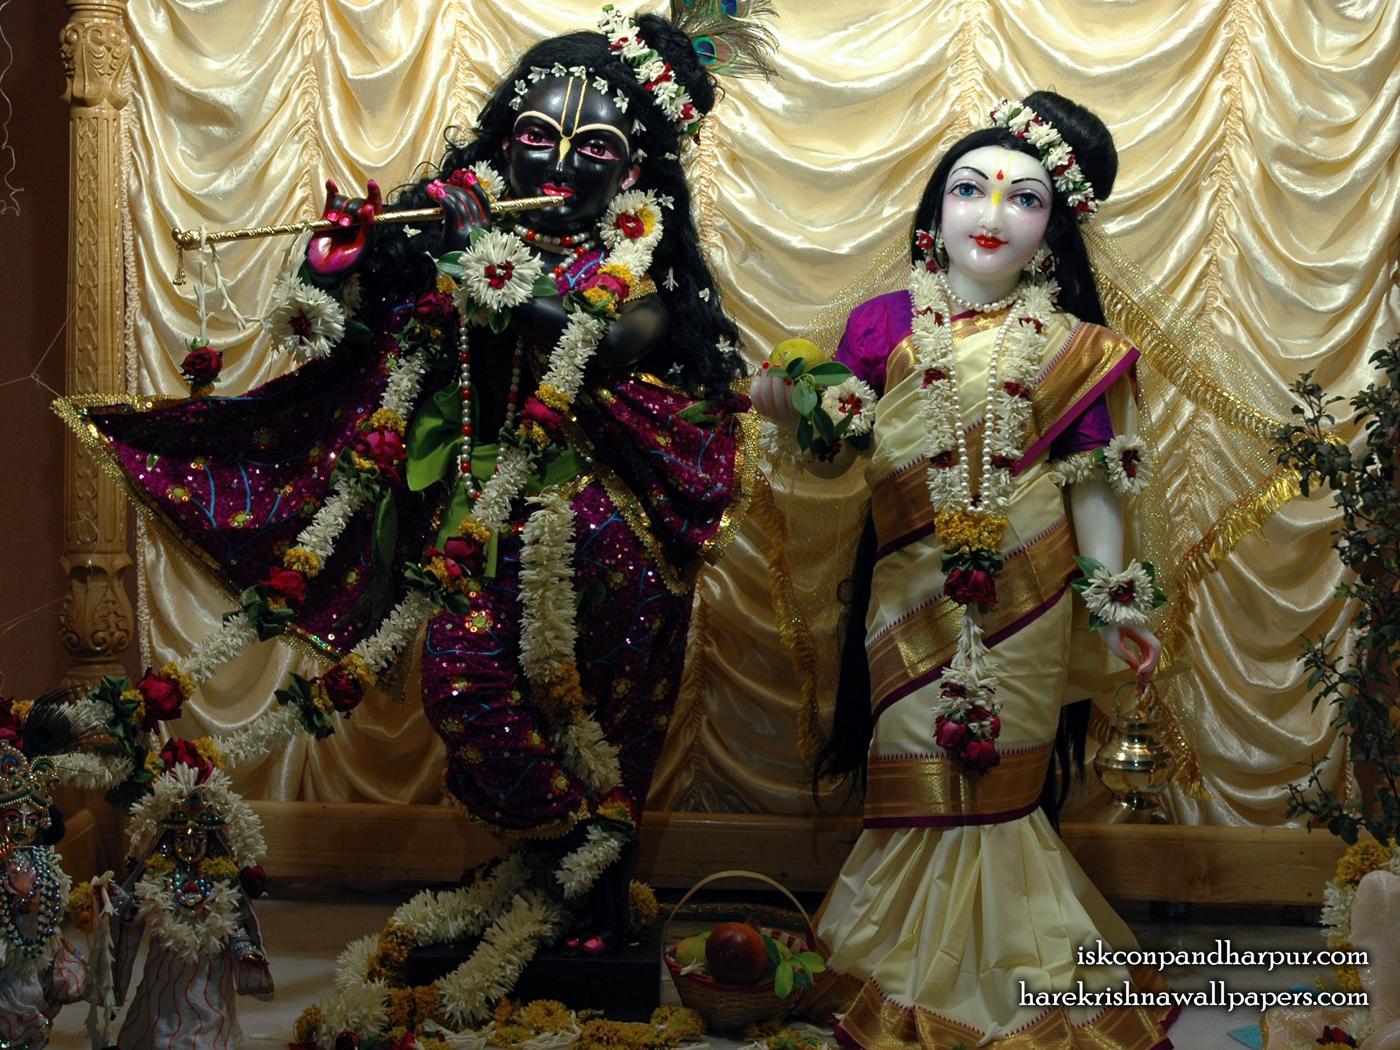 Sri Sri Radha Pandharinath Wallpaper (001) Size 1400x1050 Download